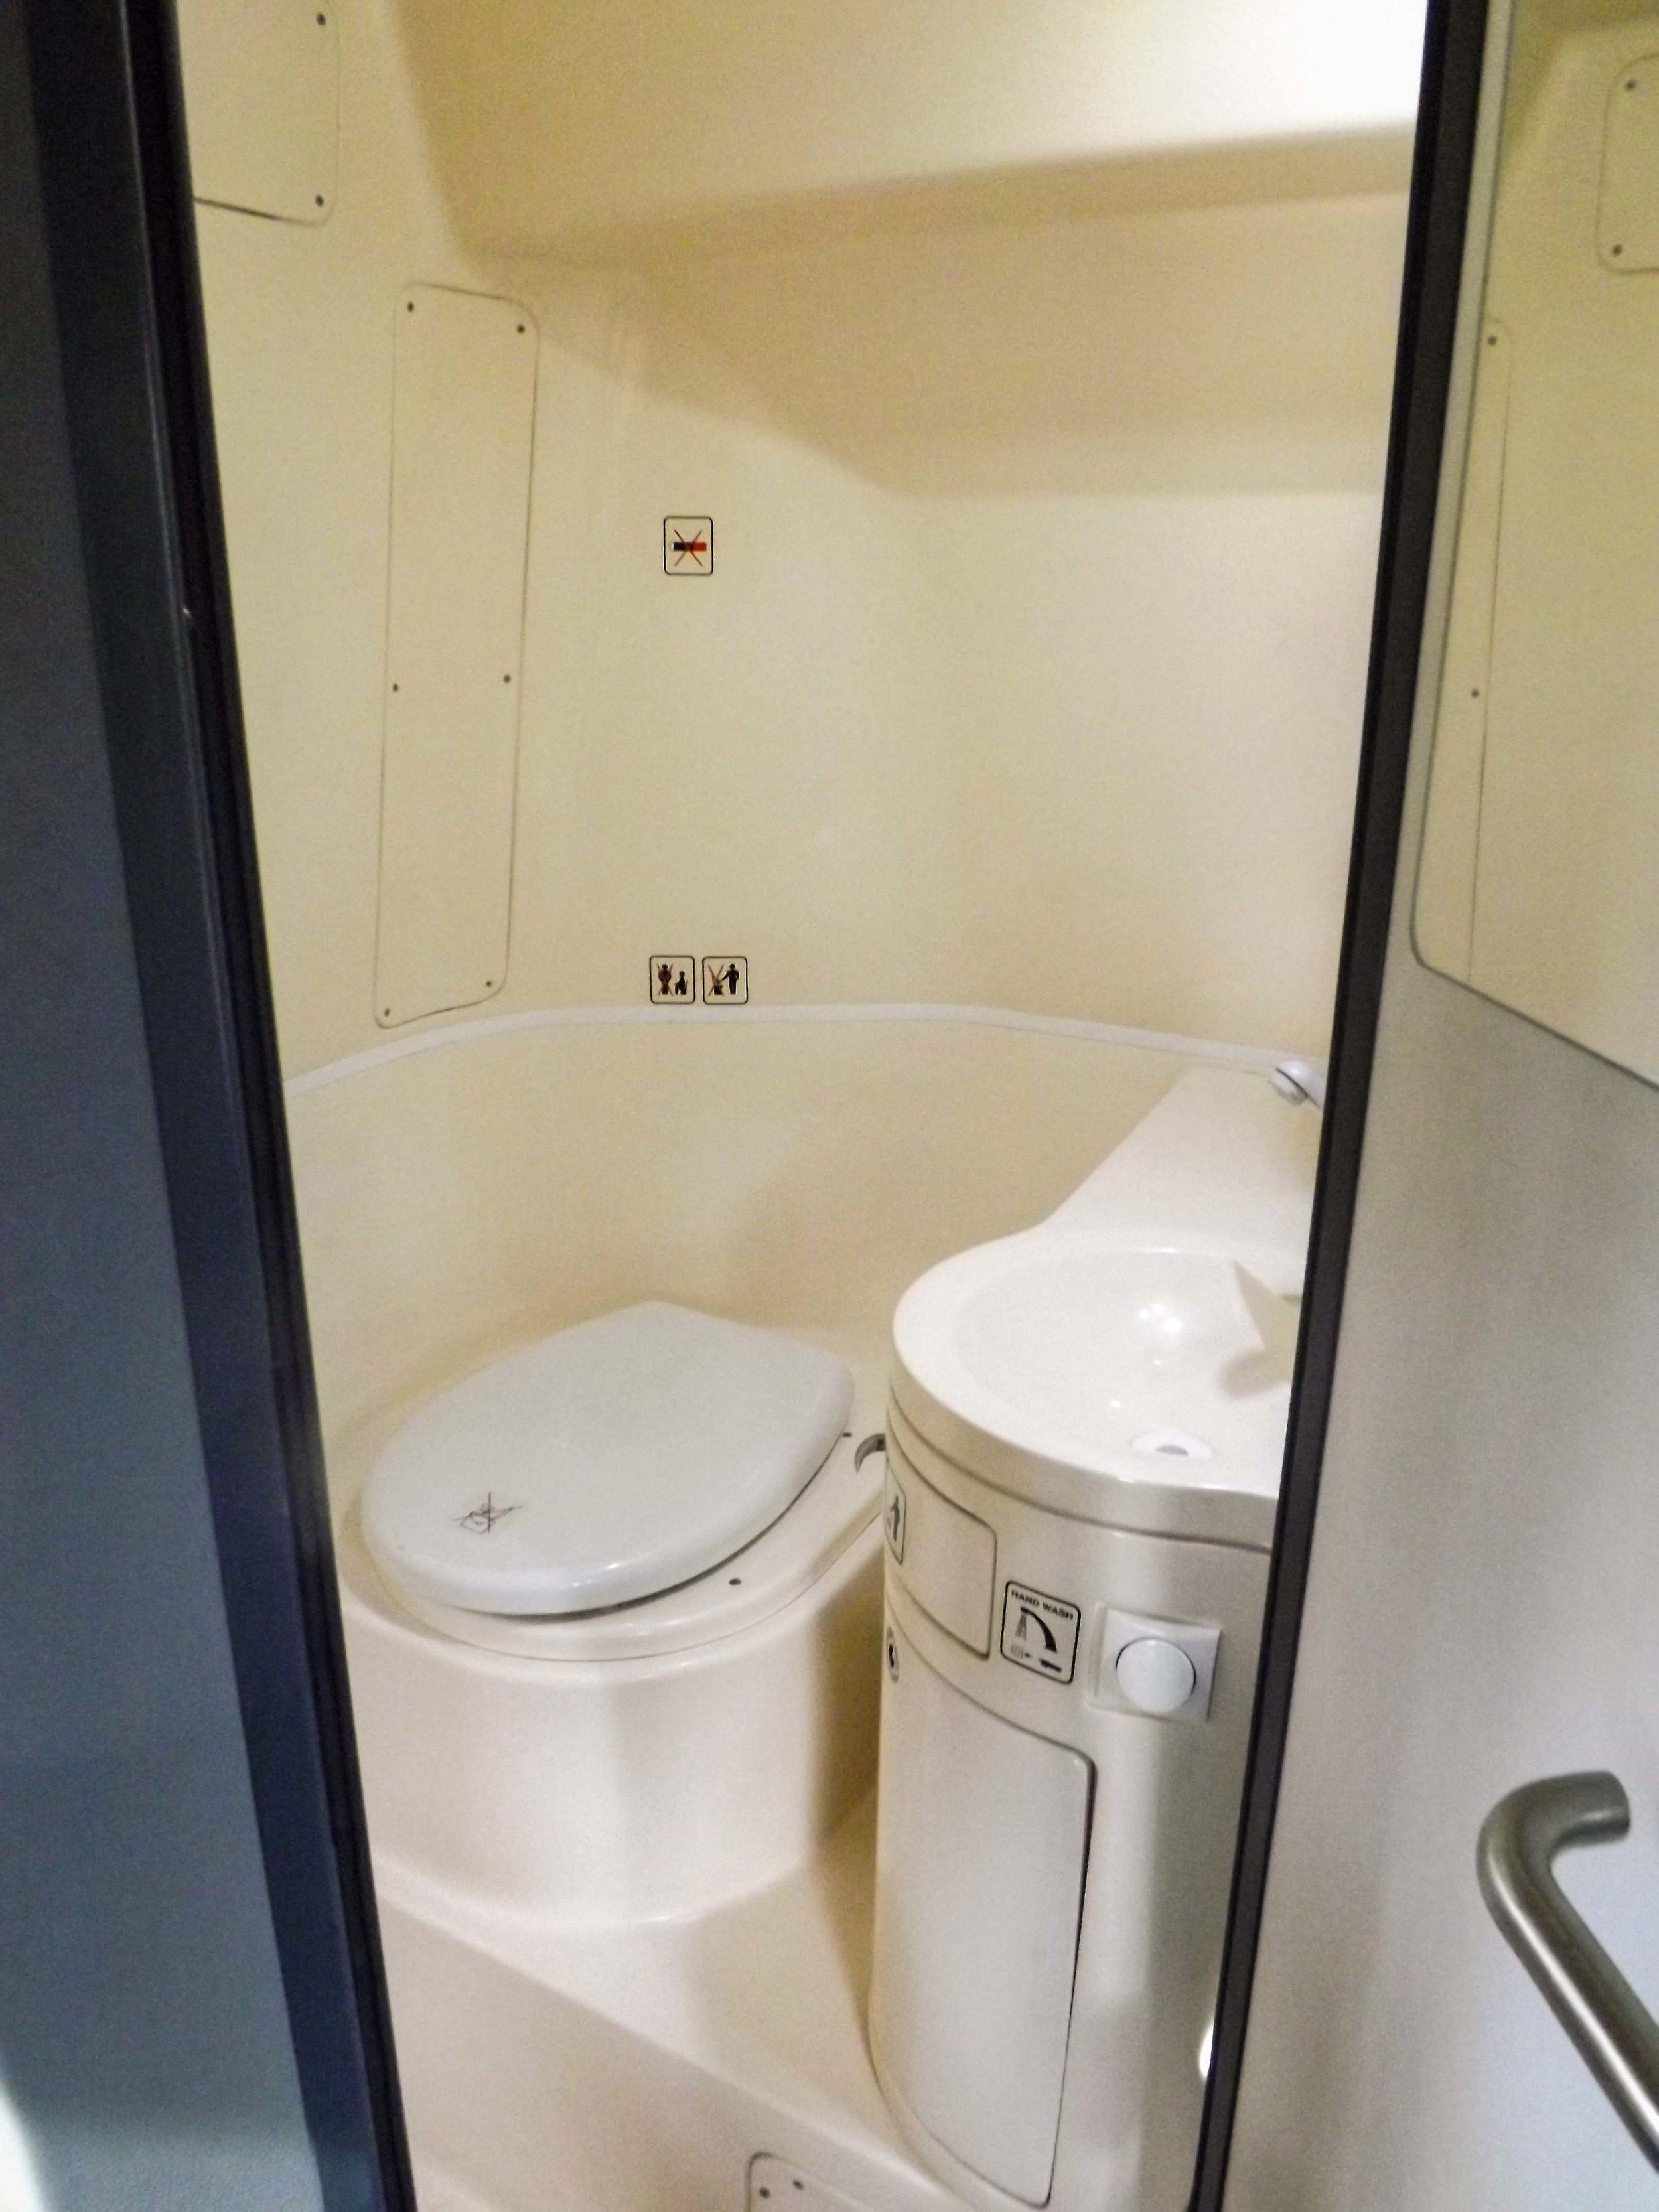 33 seat coach toilet.jpg